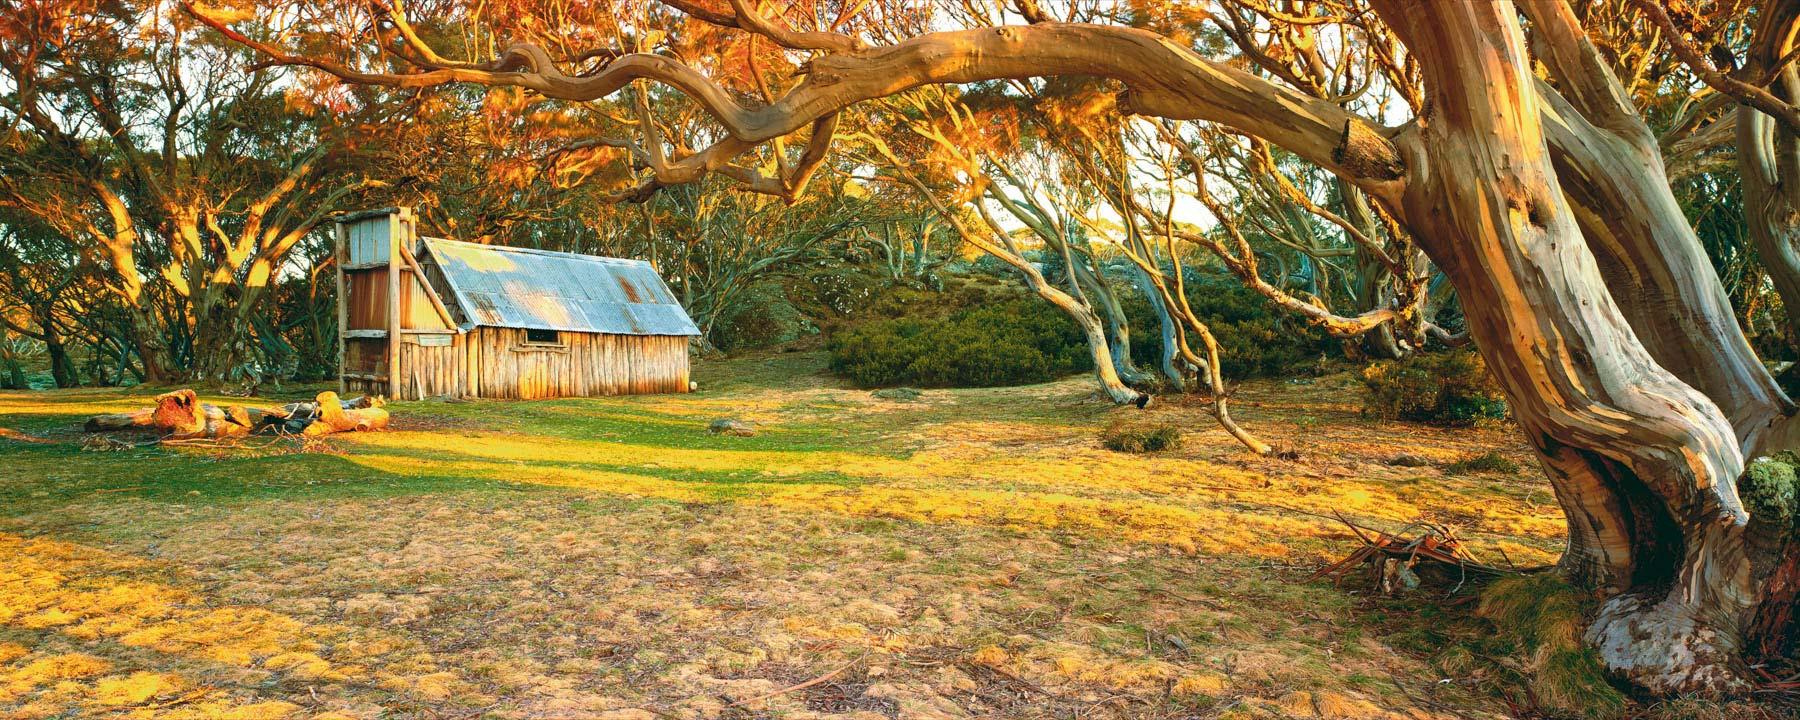 Wallace Hut, Falls Creek, Vic